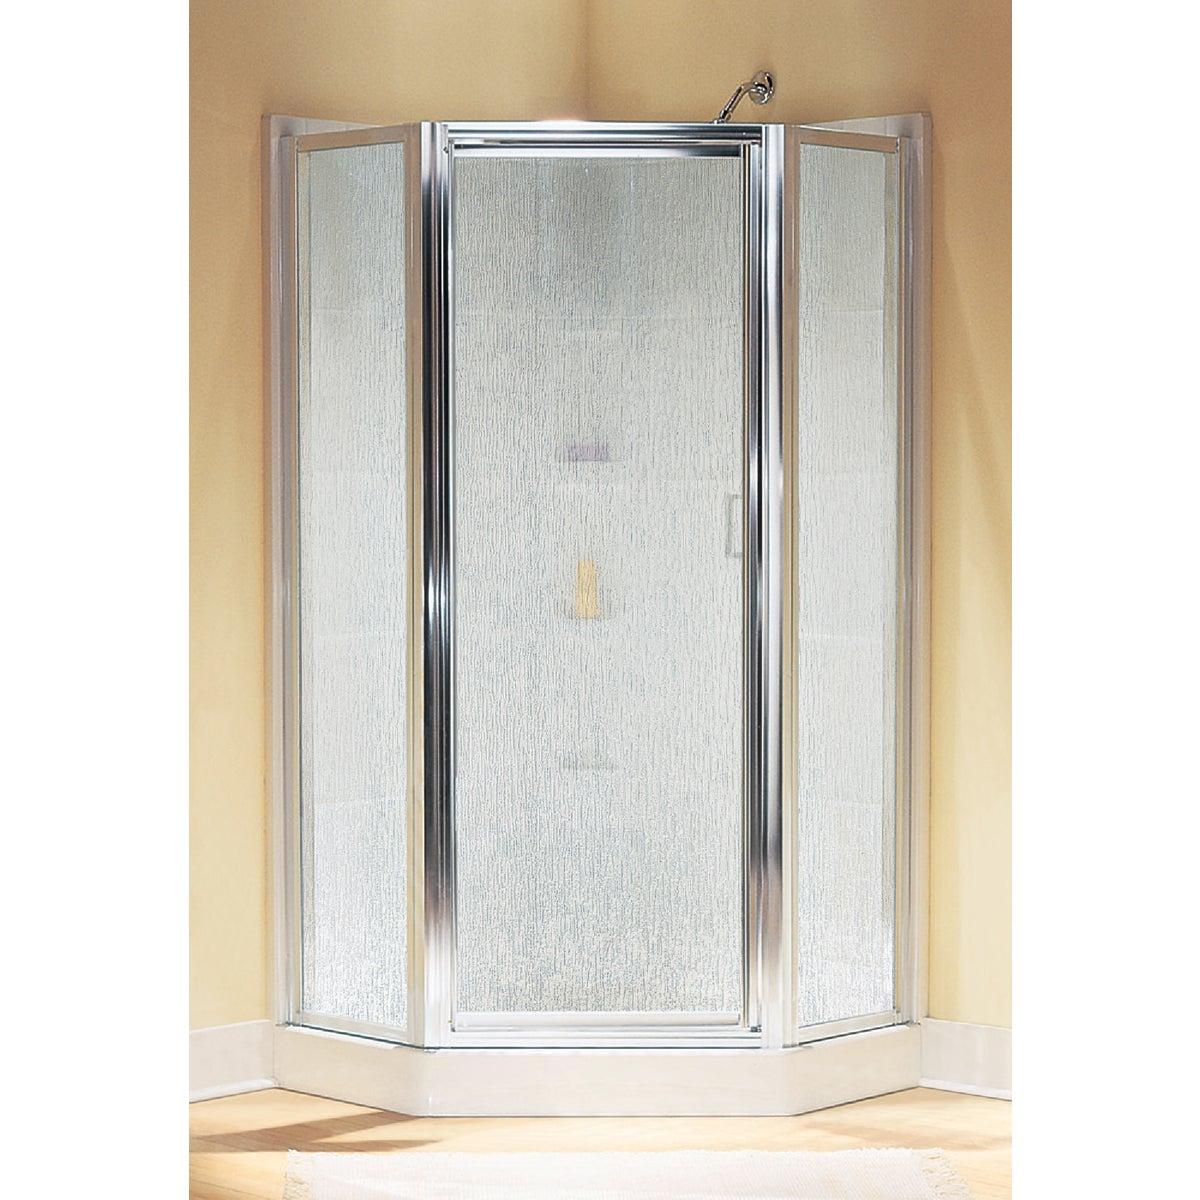 Sterling SILVER NEO SHOWER DOOR SP2276A-38S